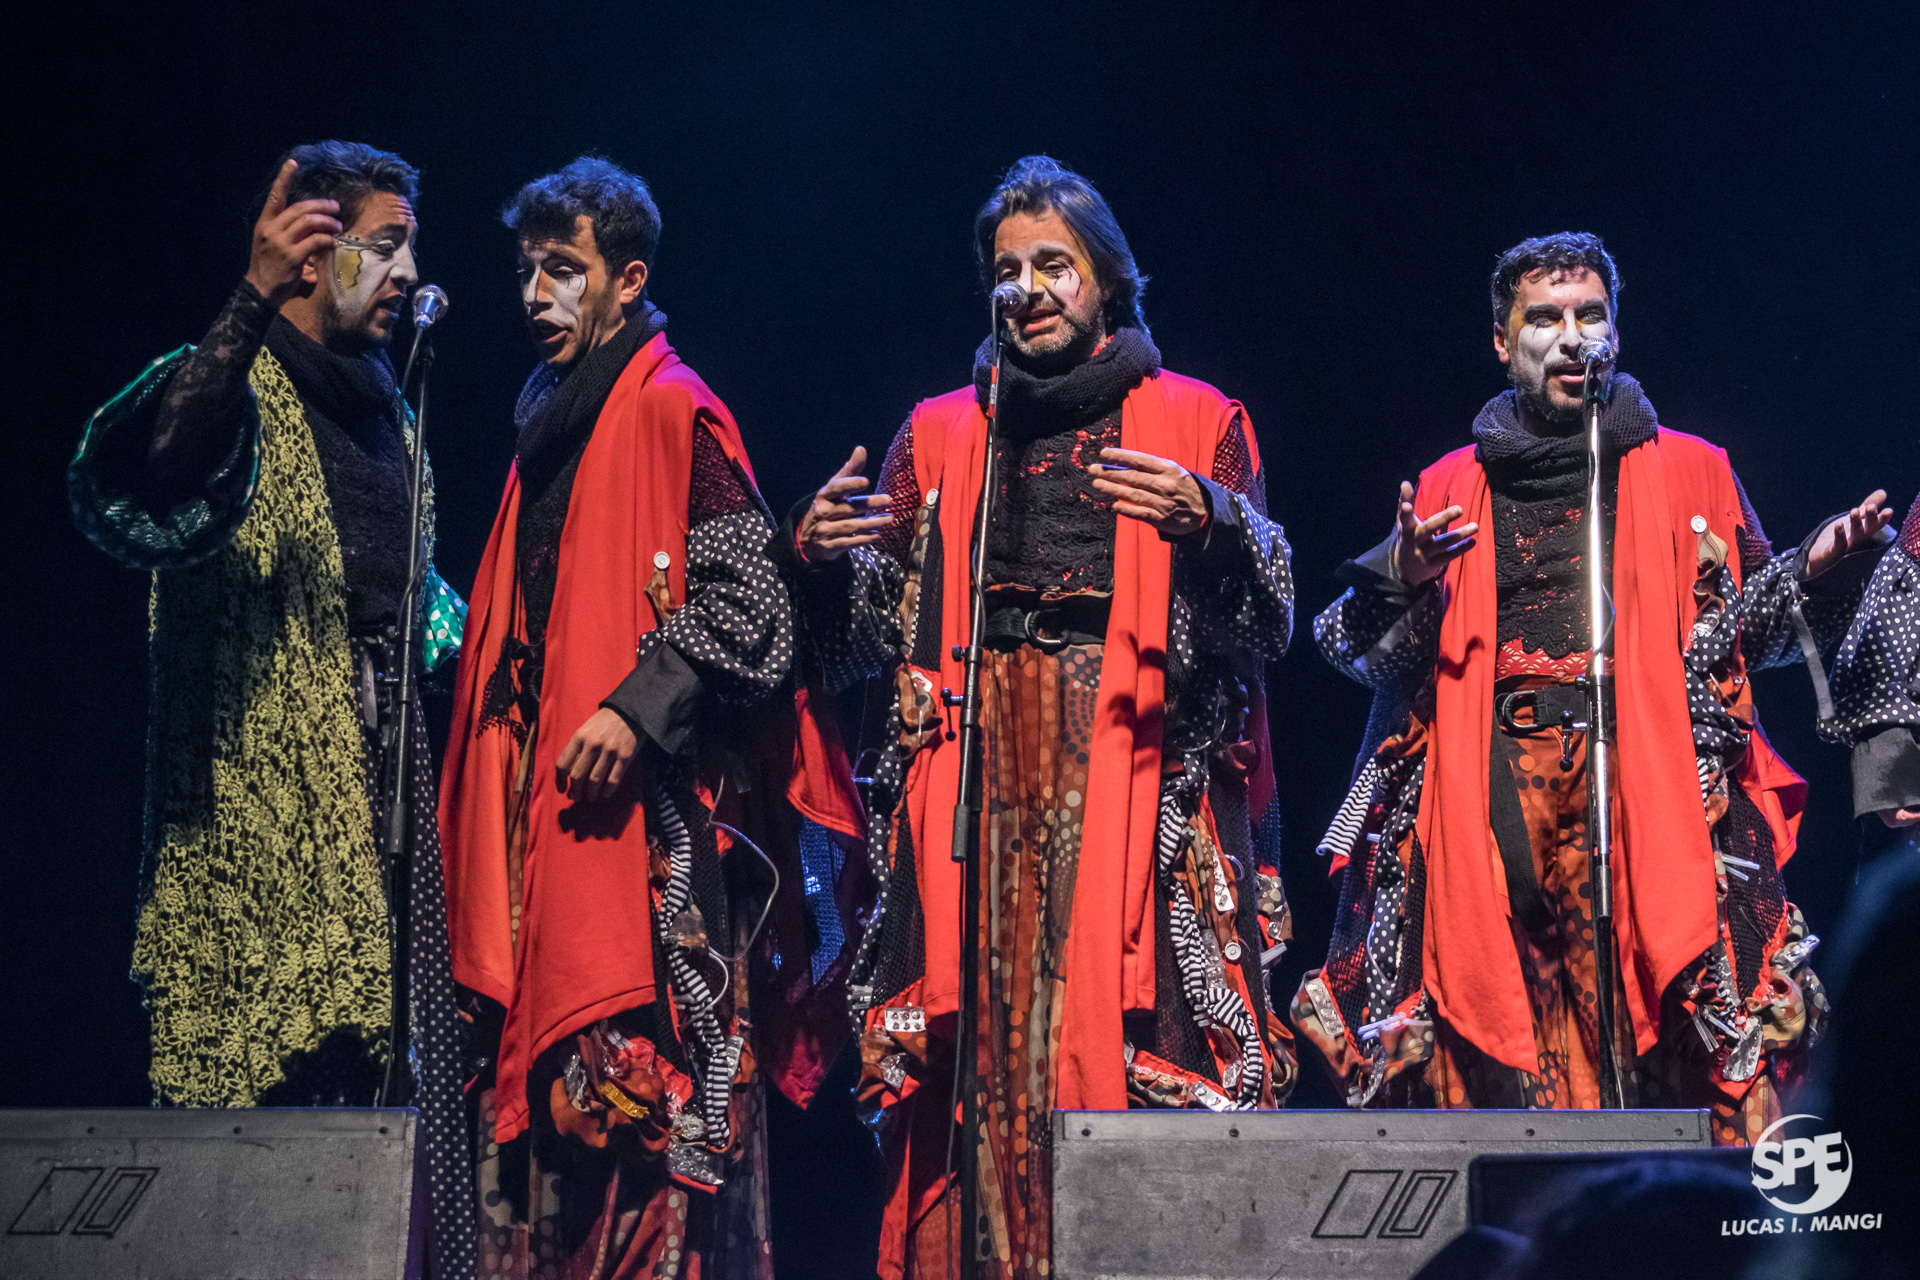 La_Trasnochada_Opera_Orbis_190630_Lucas_Mangi_SPE_12.jpg